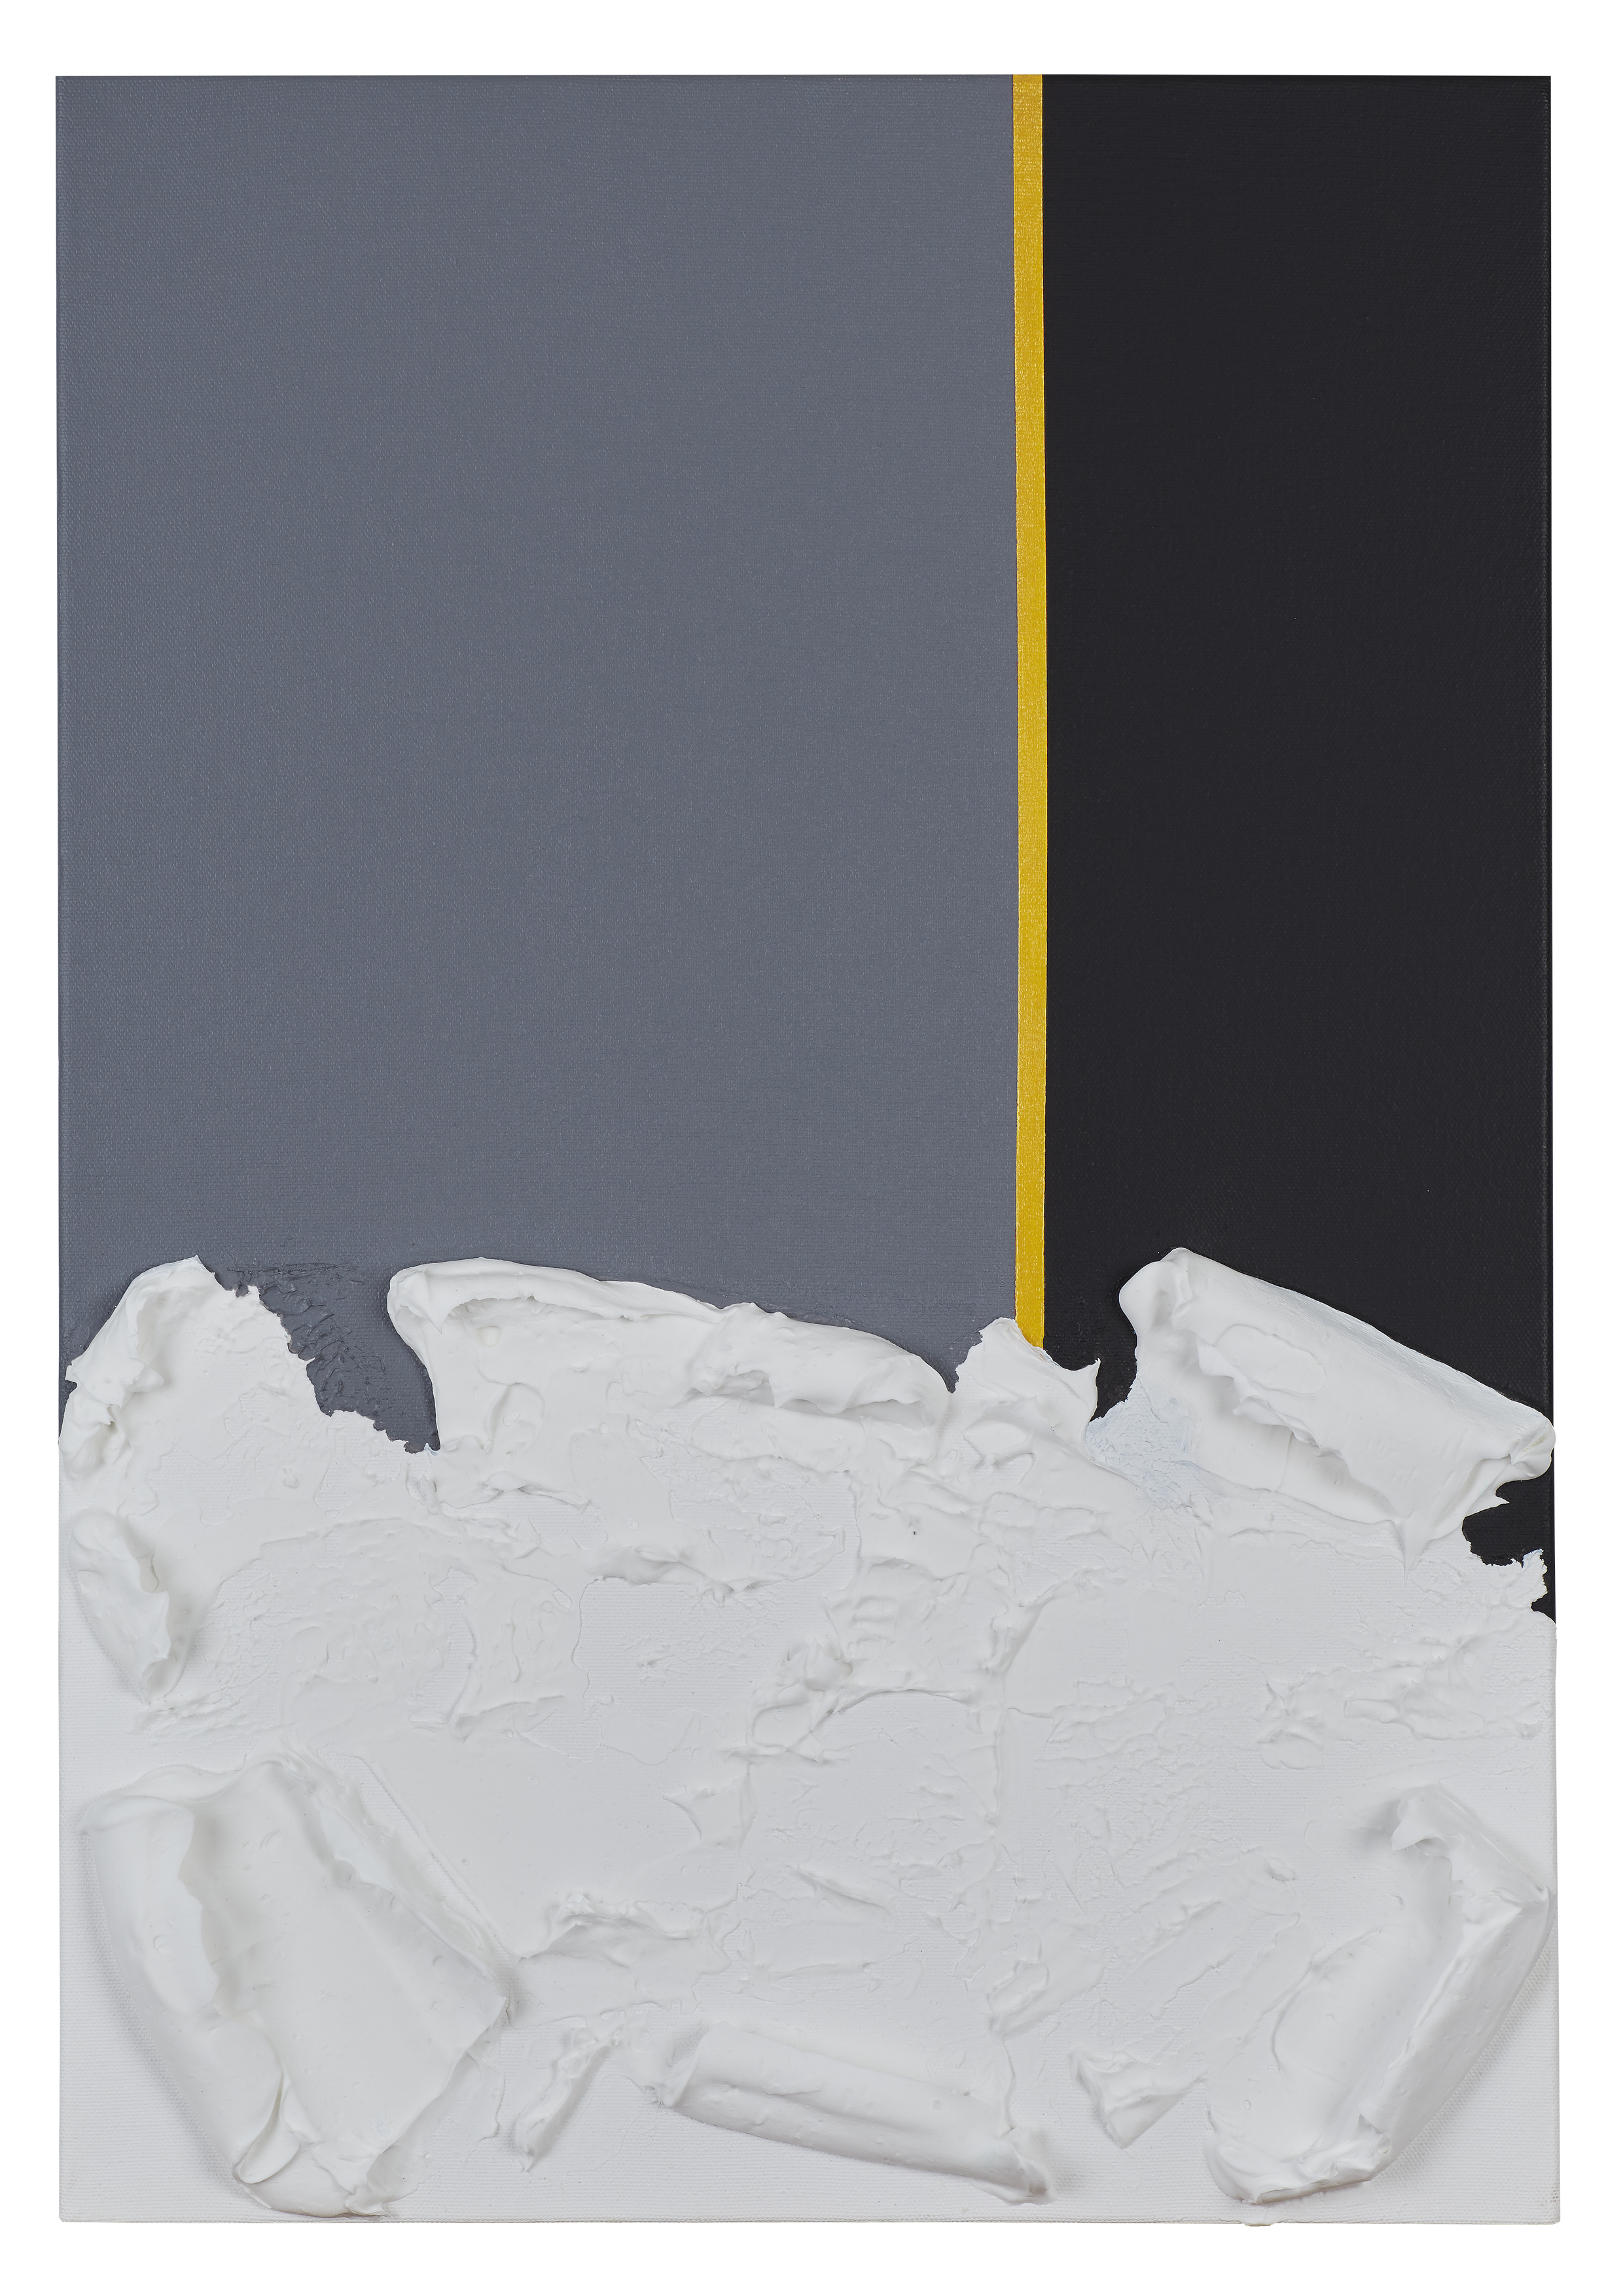 Transcendence 37 Yellow line, CHO Yea Ja